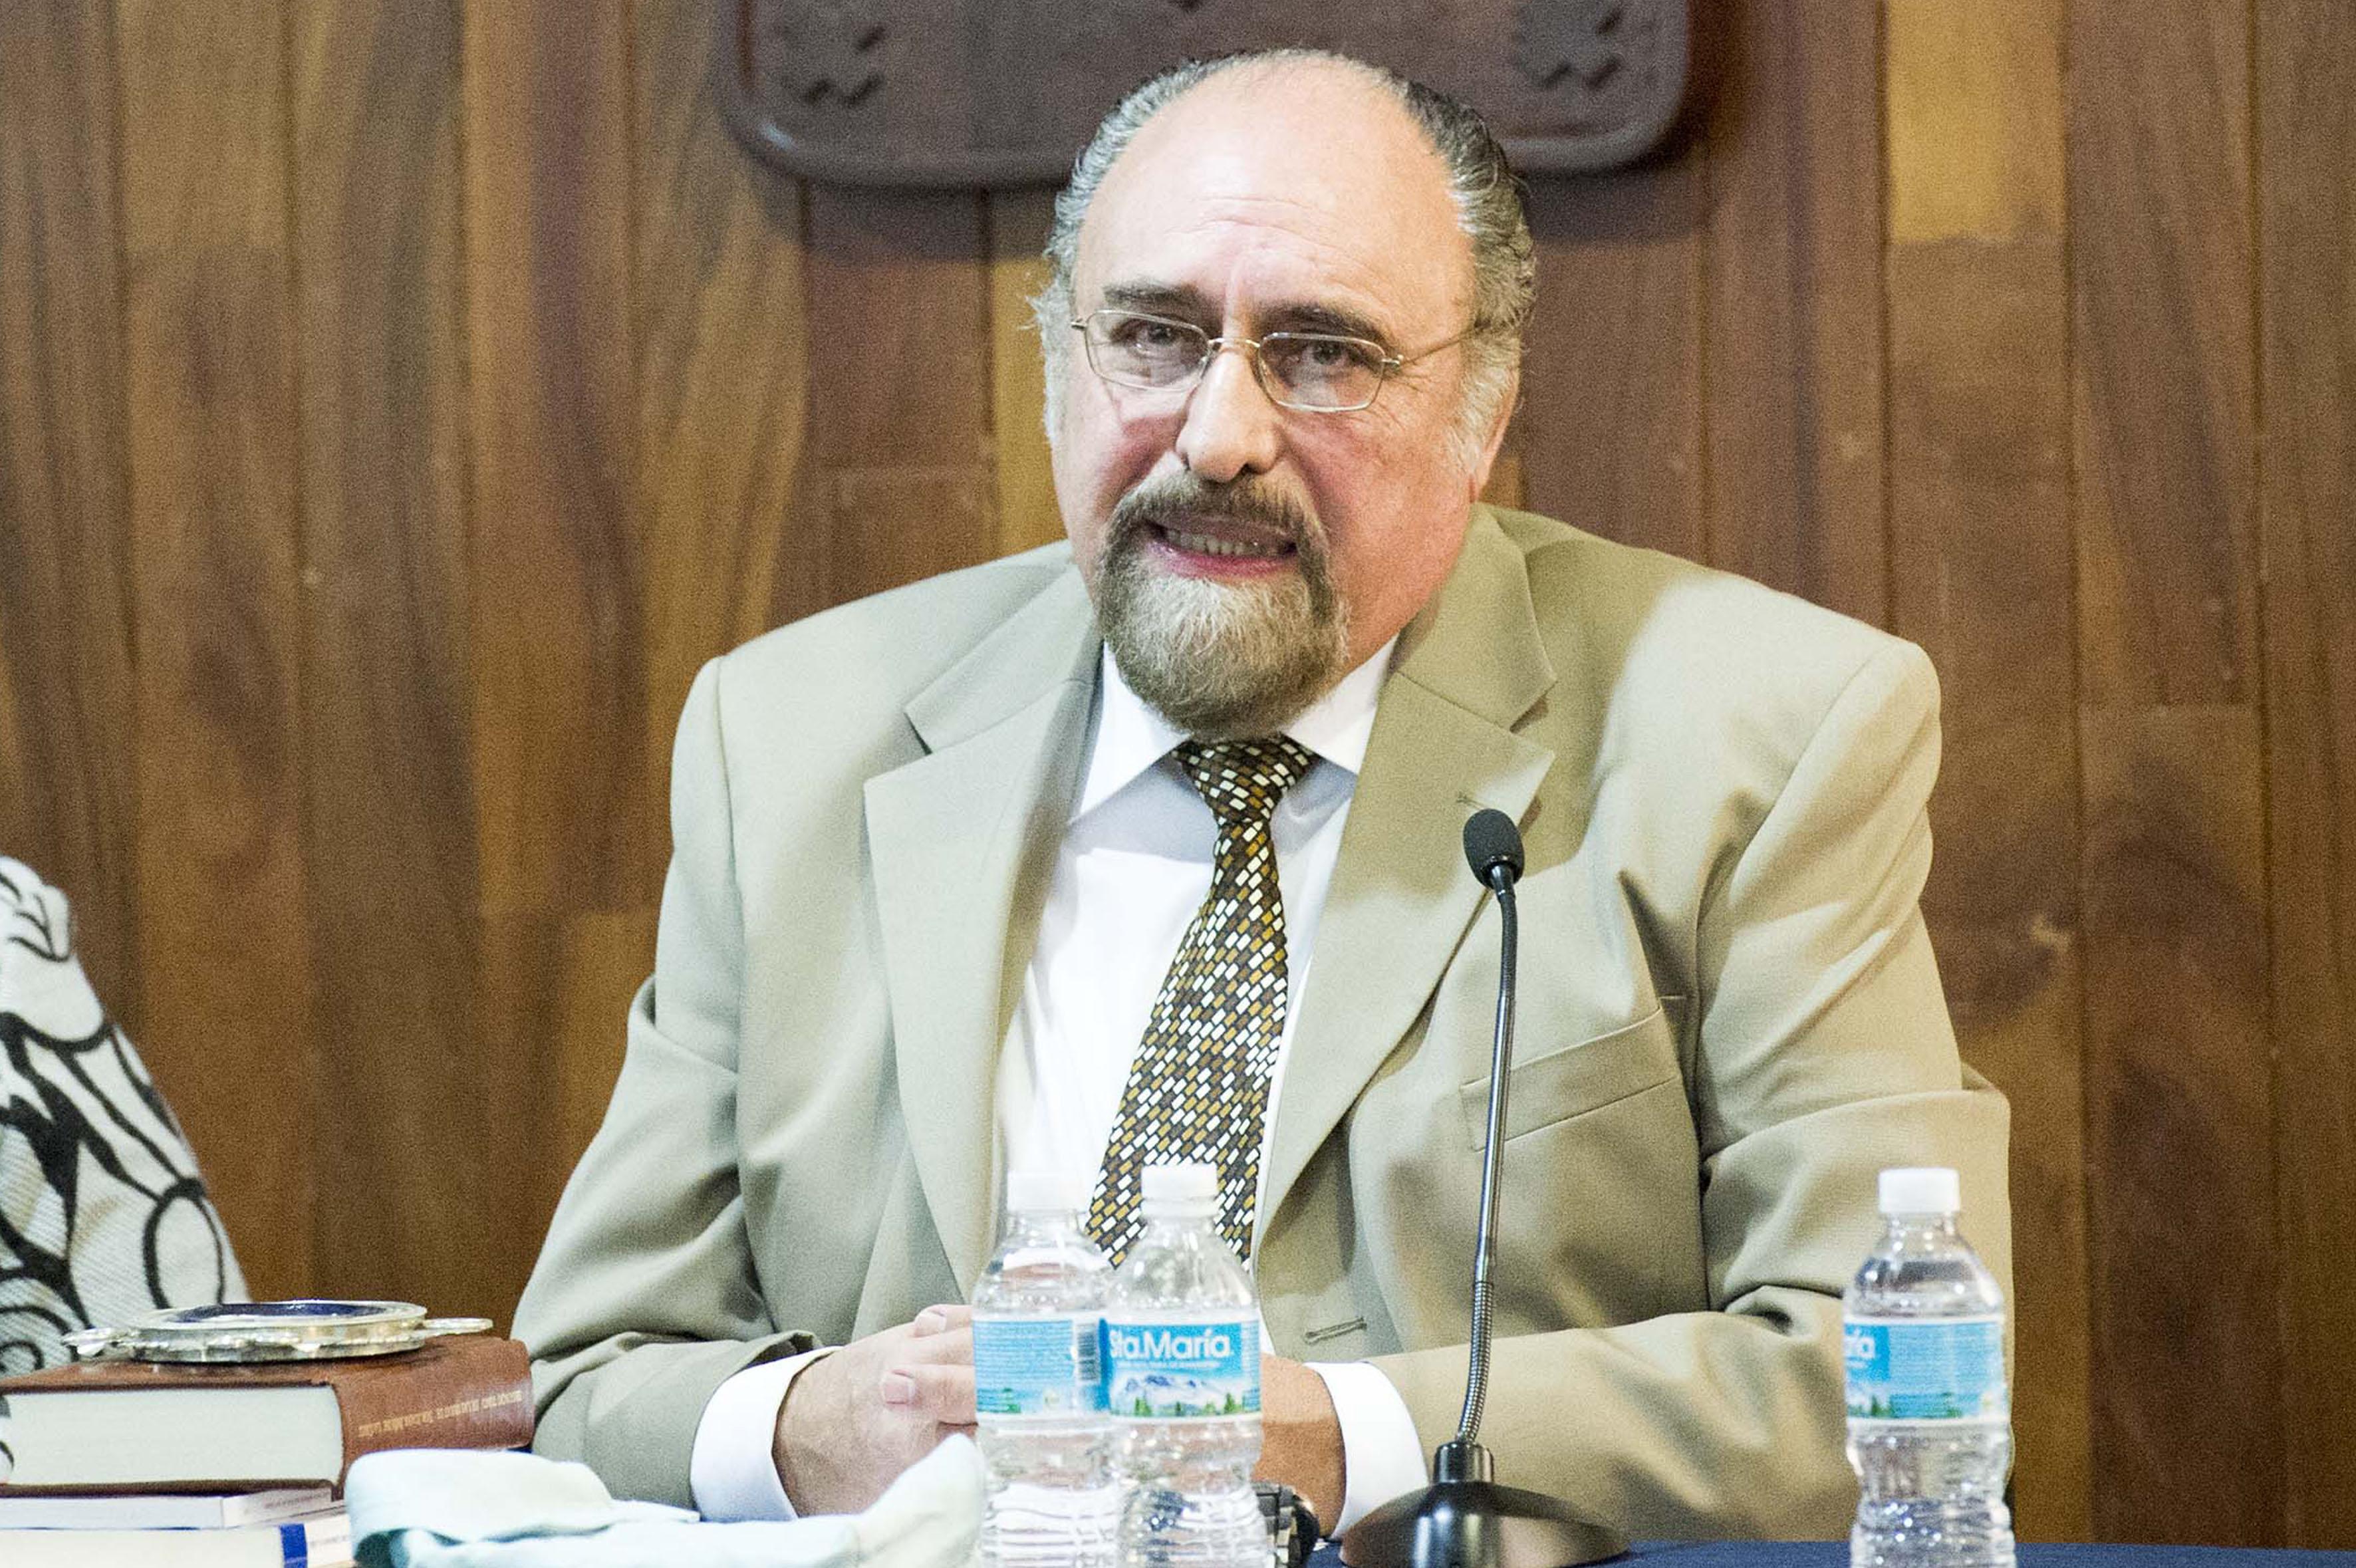 Doctor Guillermo Schmidhuber de la Mora.